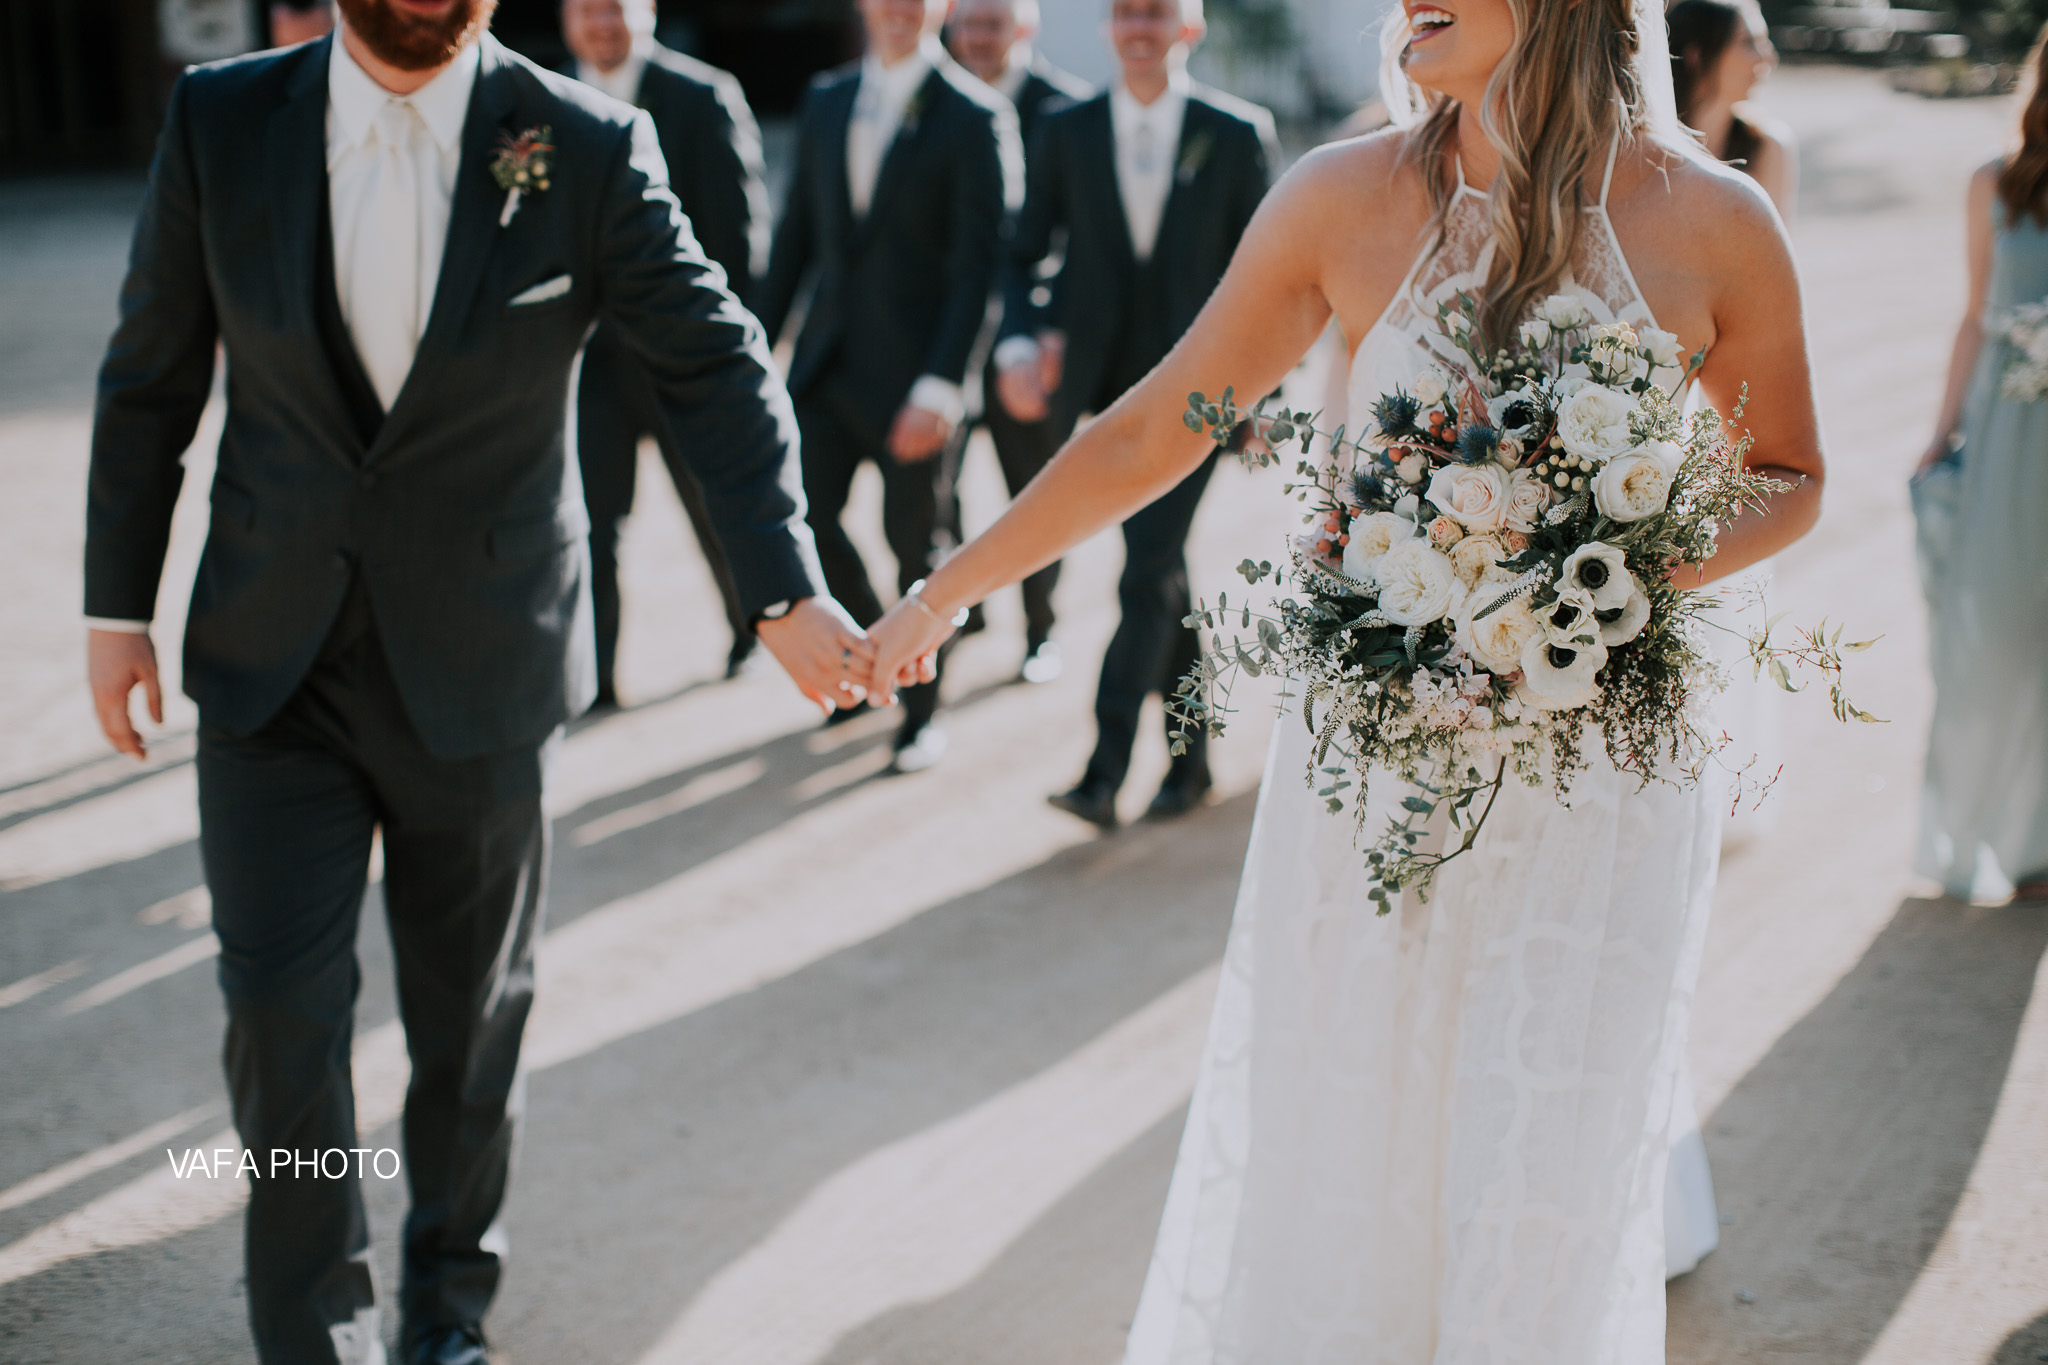 Leo-Carrillo-Ranch-Wedding-Lauren-Mike-Vafa-Photo-668.jpg